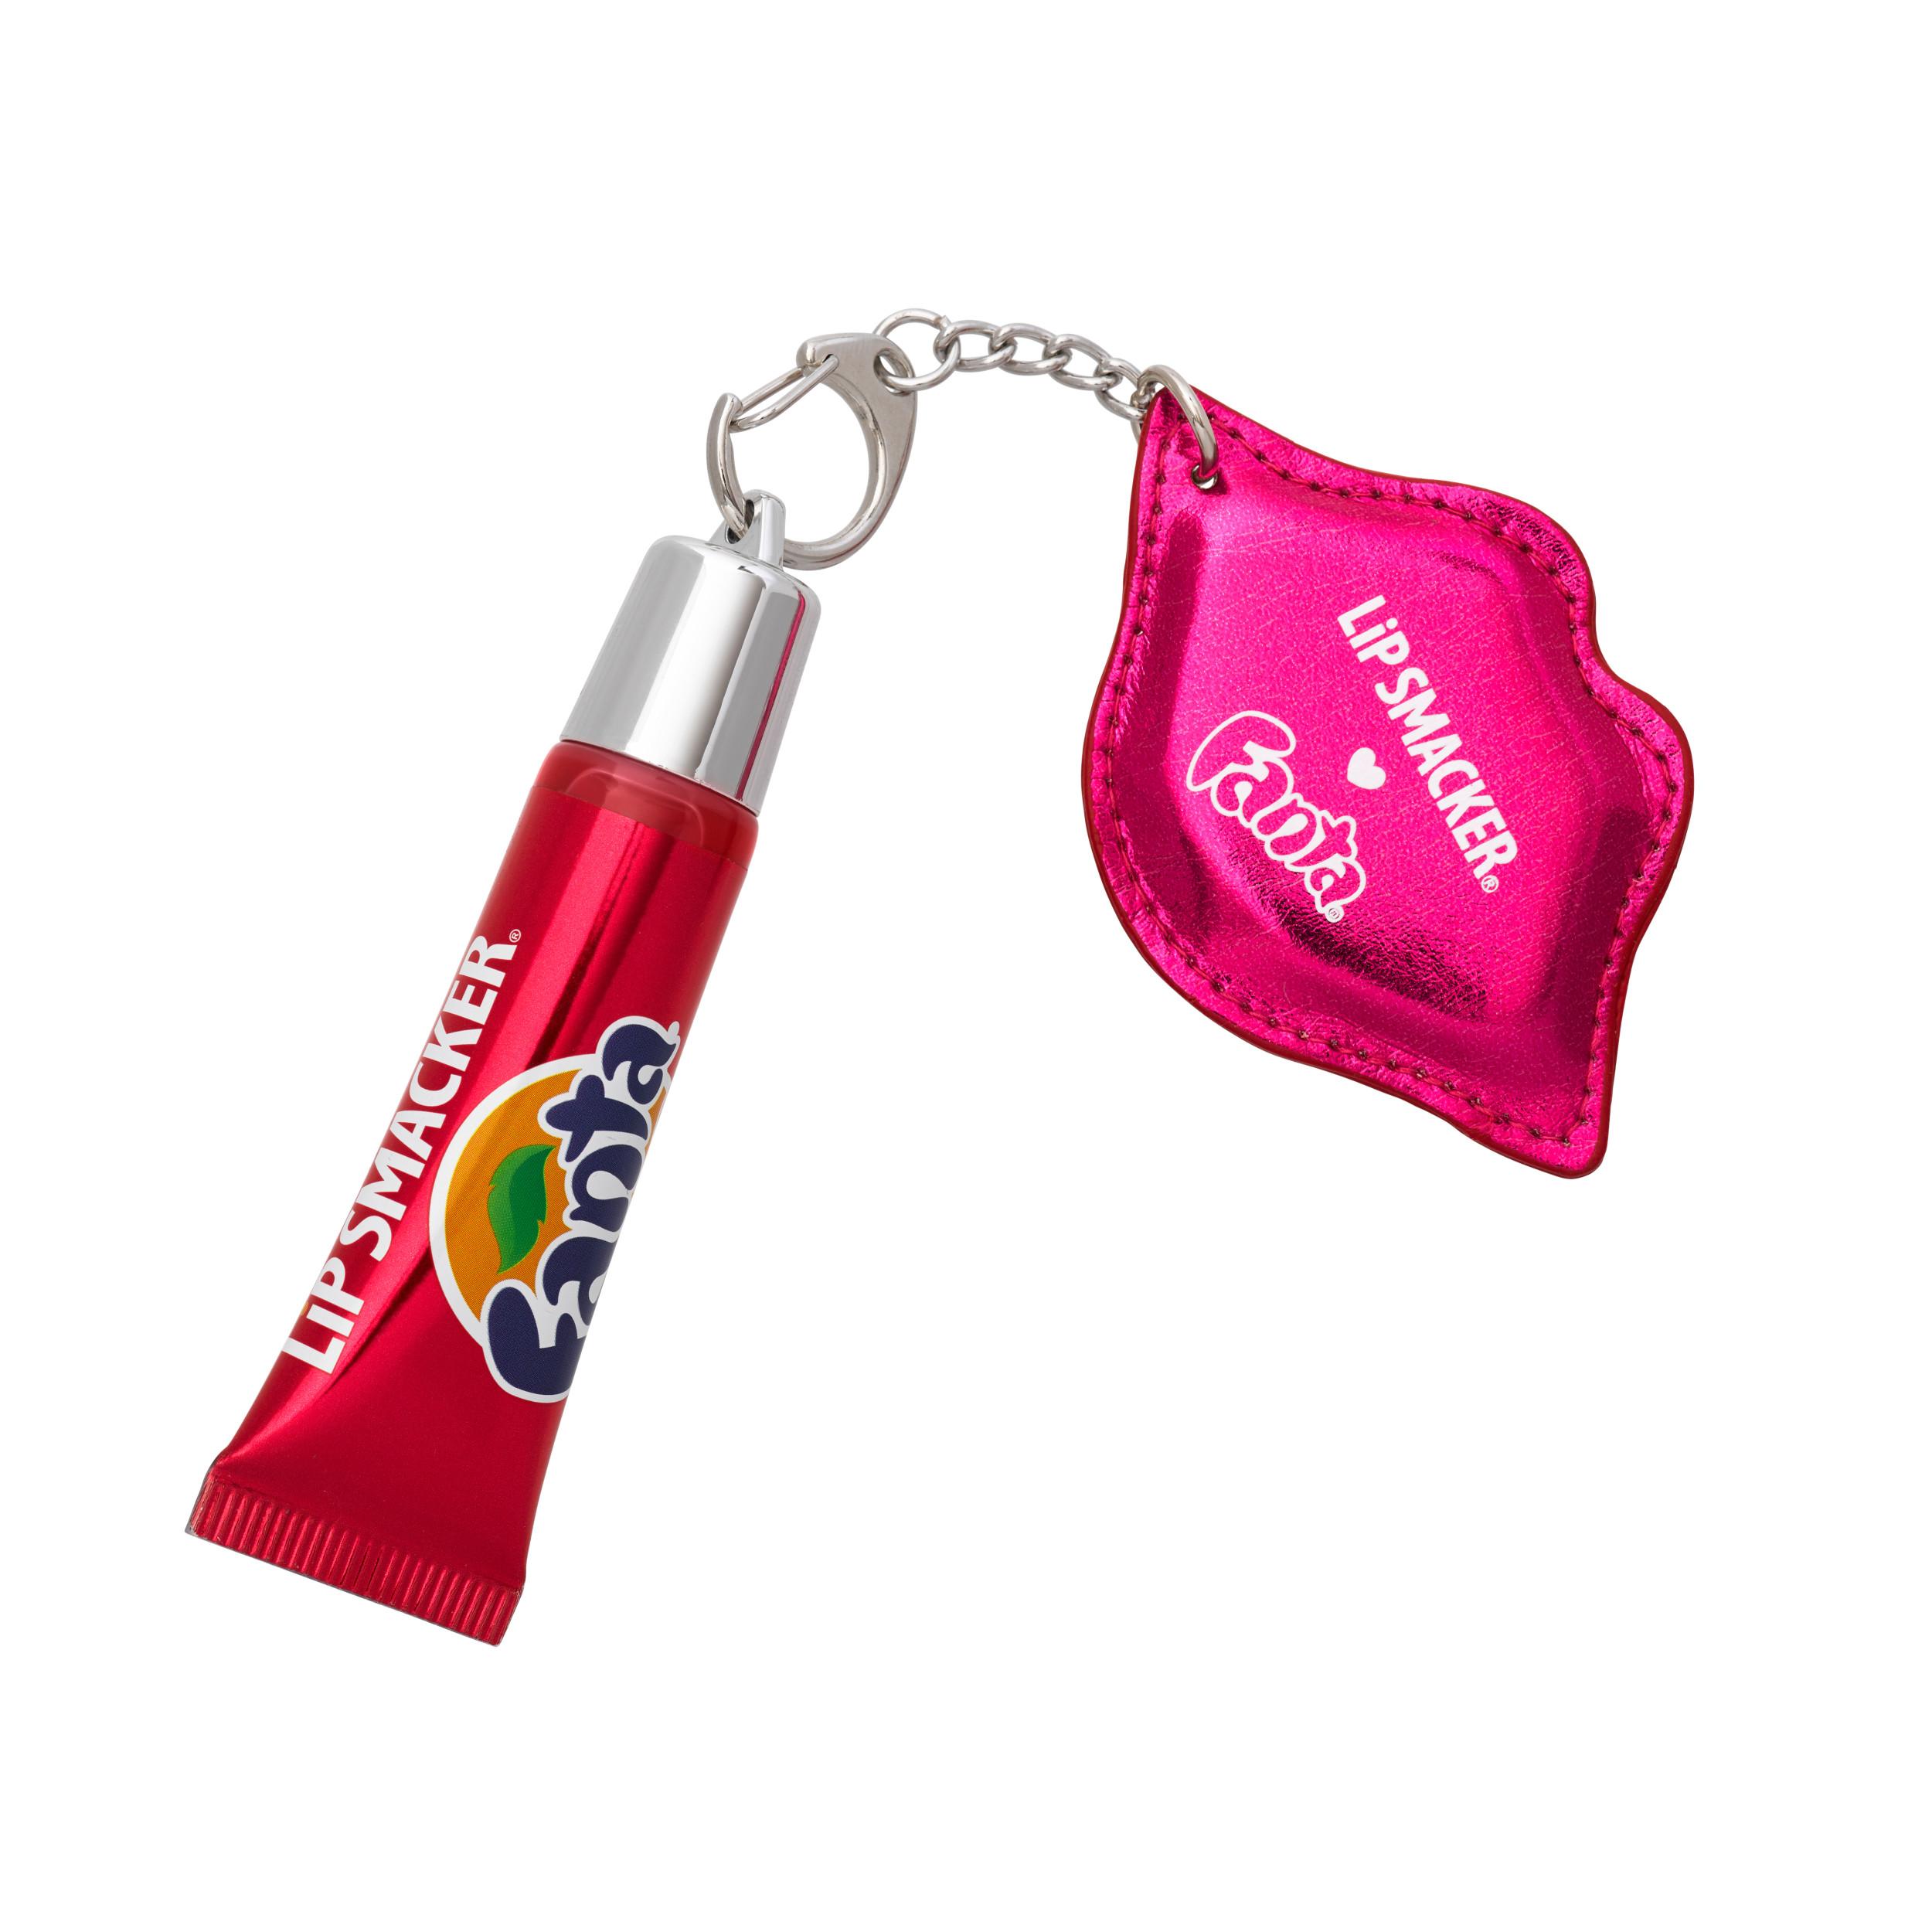 (2 Pack) Lip Smacker Fanta Stawberry Refresh Lip Gloss with Keychain